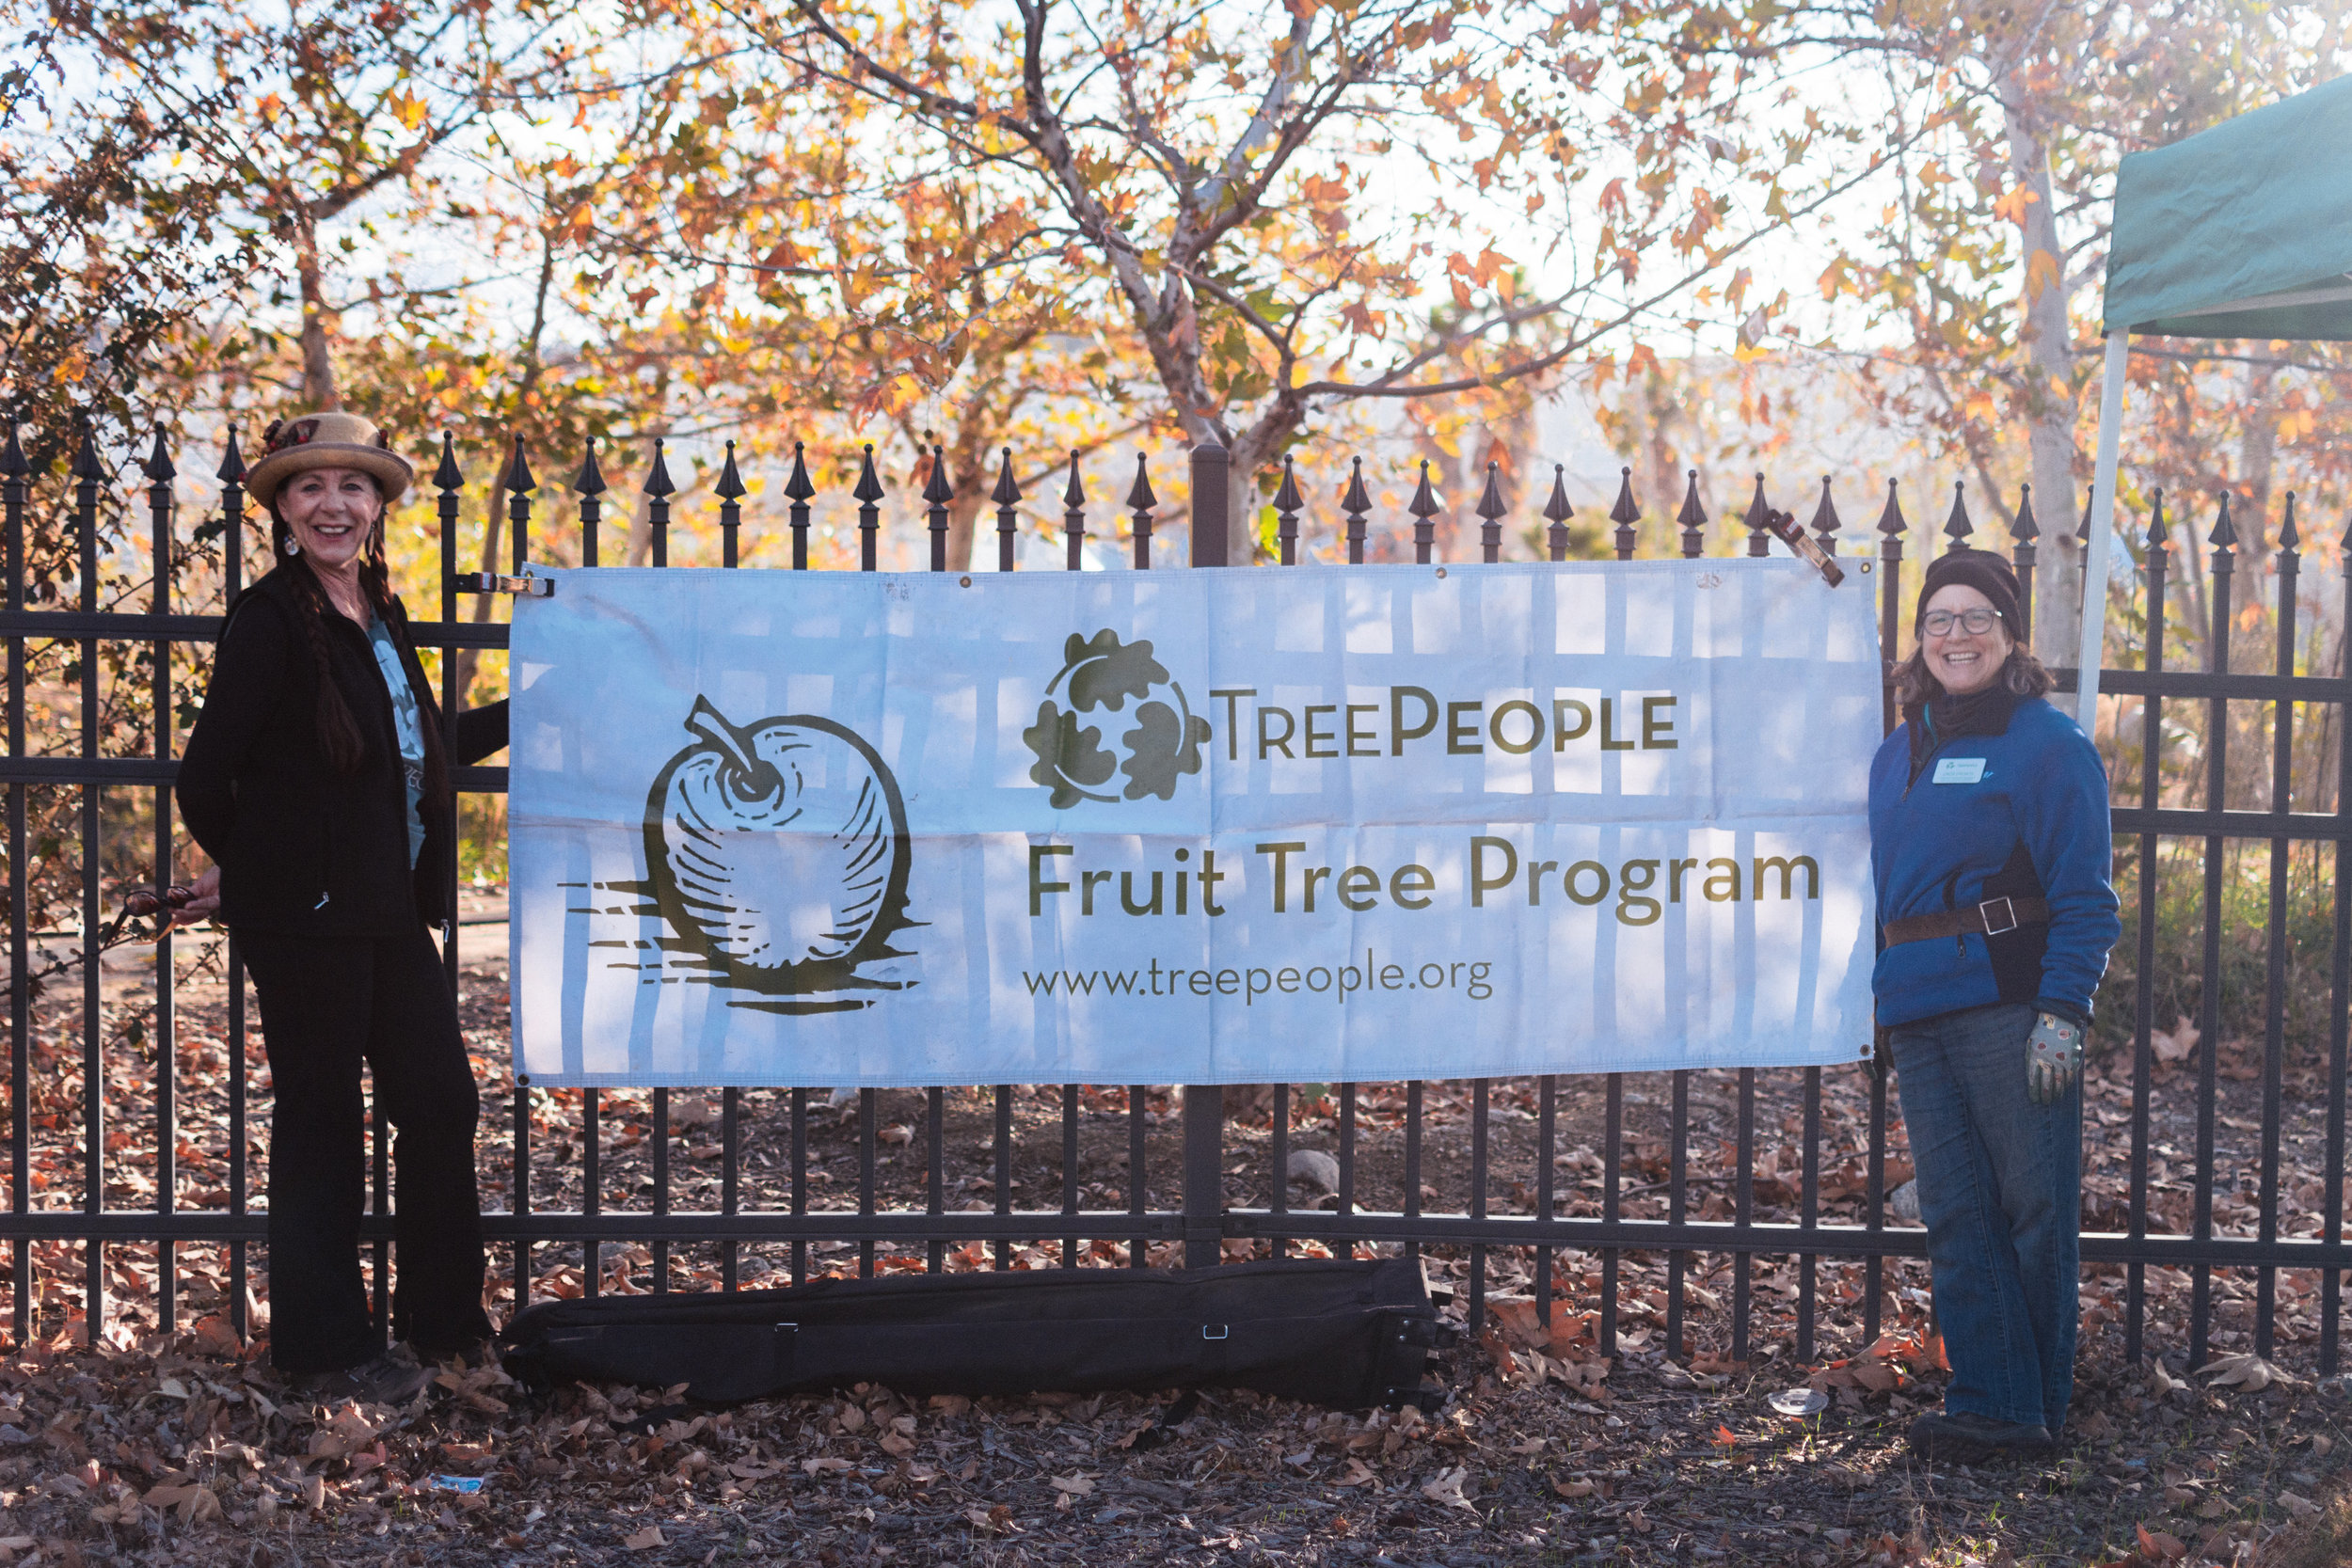 TreePeople-FruitTrees-3131.jpg